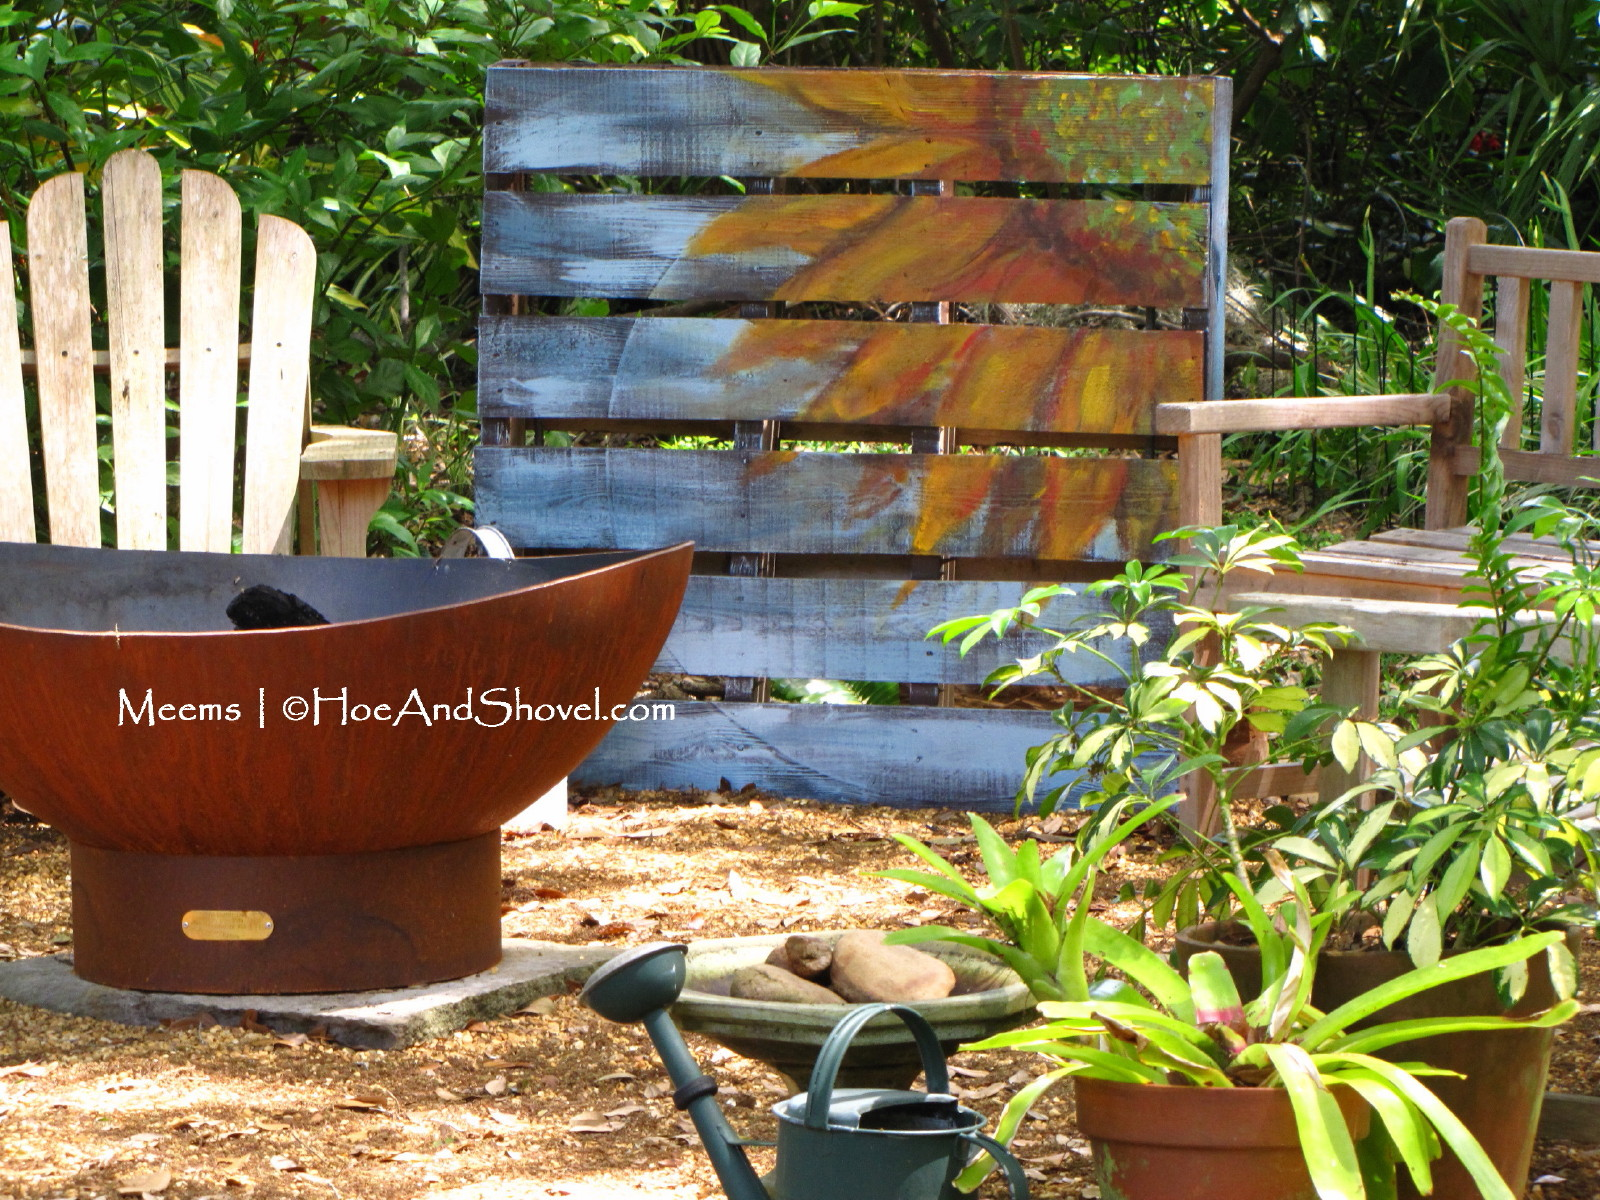 Hoe and Shovel: Upcycled Wooden Pallet Garden Art